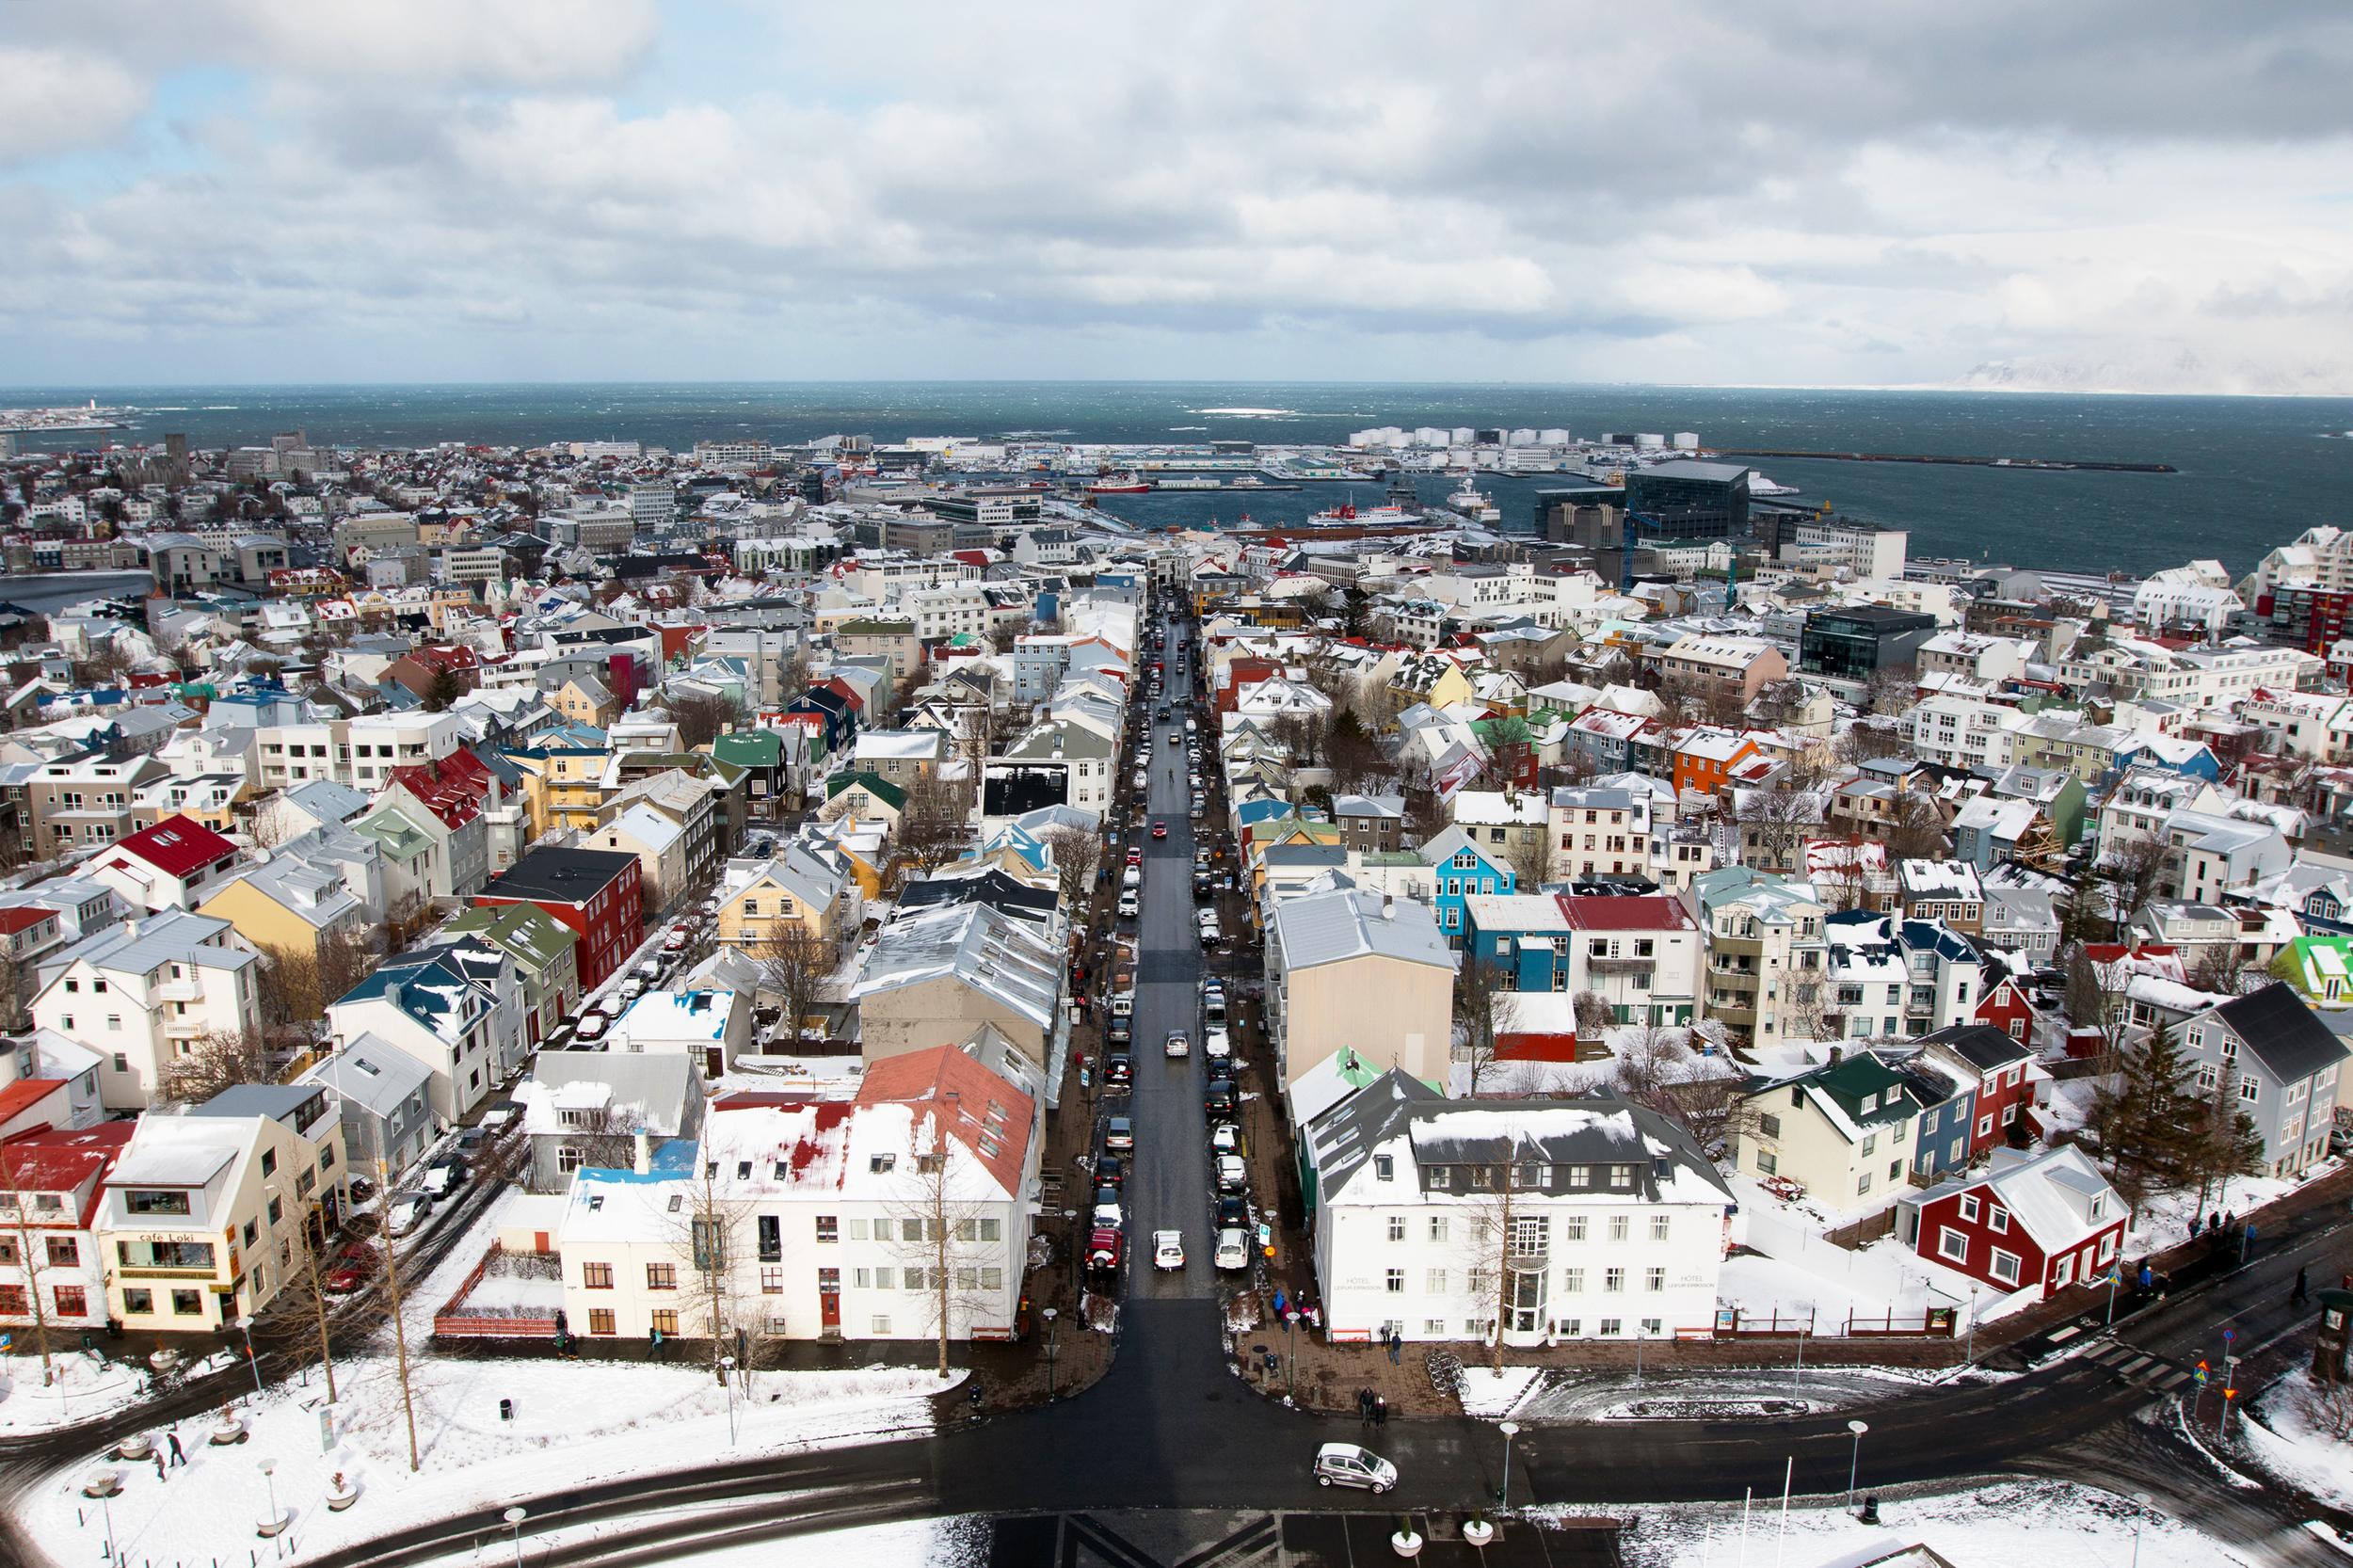 View of Reykjavík from the clock tower of Hallgrímskirkja Church